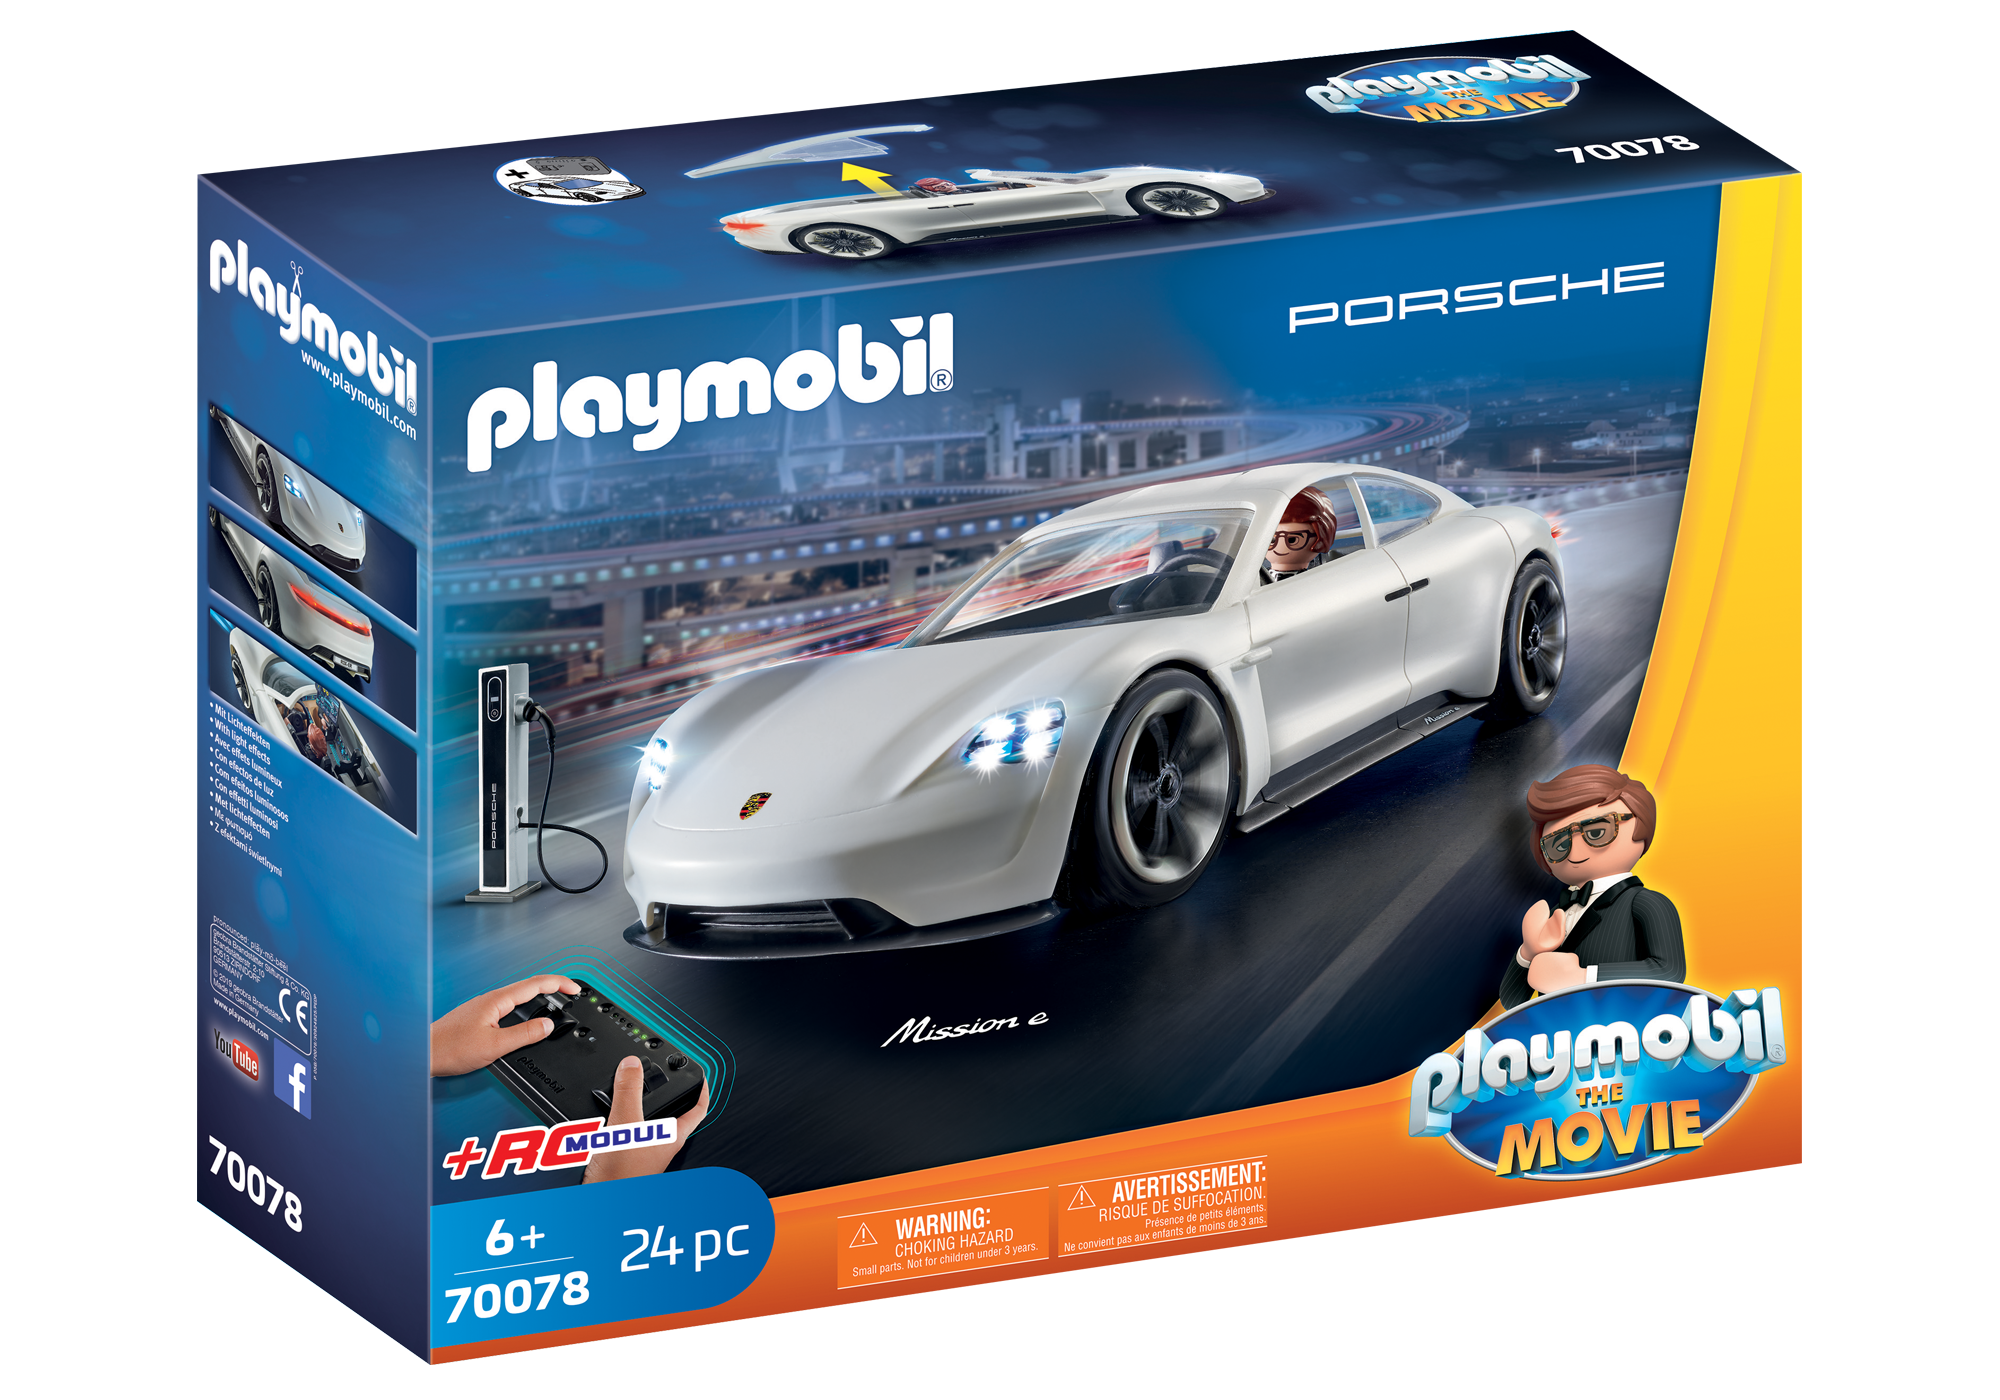 http://media.playmobil.com/i/playmobil/70078_product_box_front/PLAYMOBIL:THE MOVIE Rex Dasher's Porsche Mission E